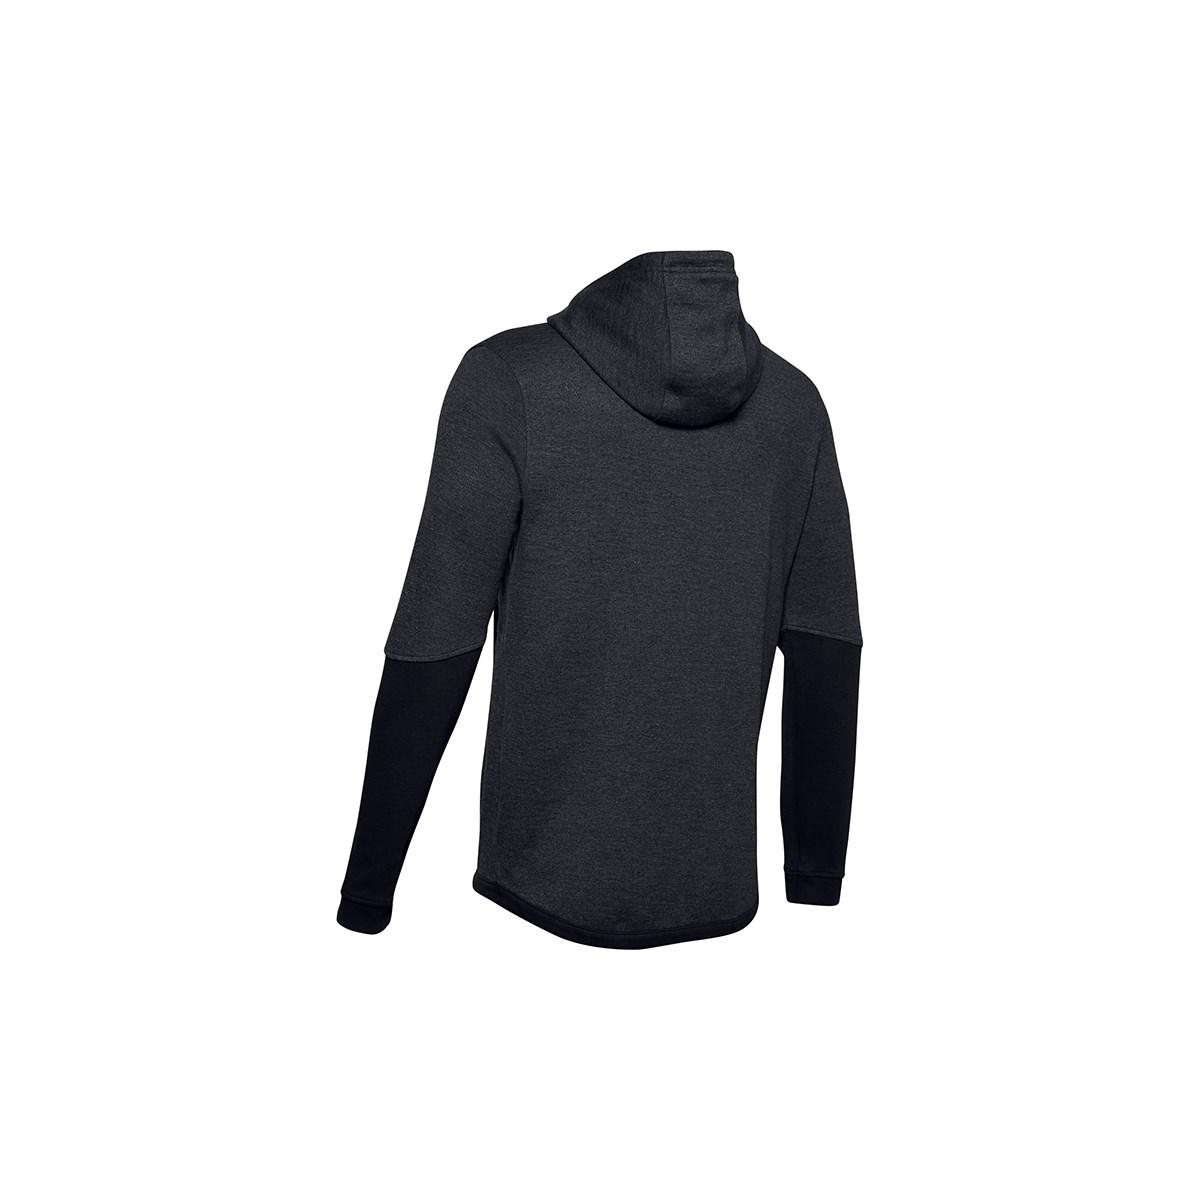 Double Knit Fz Erkek Siyah Sweatshirt